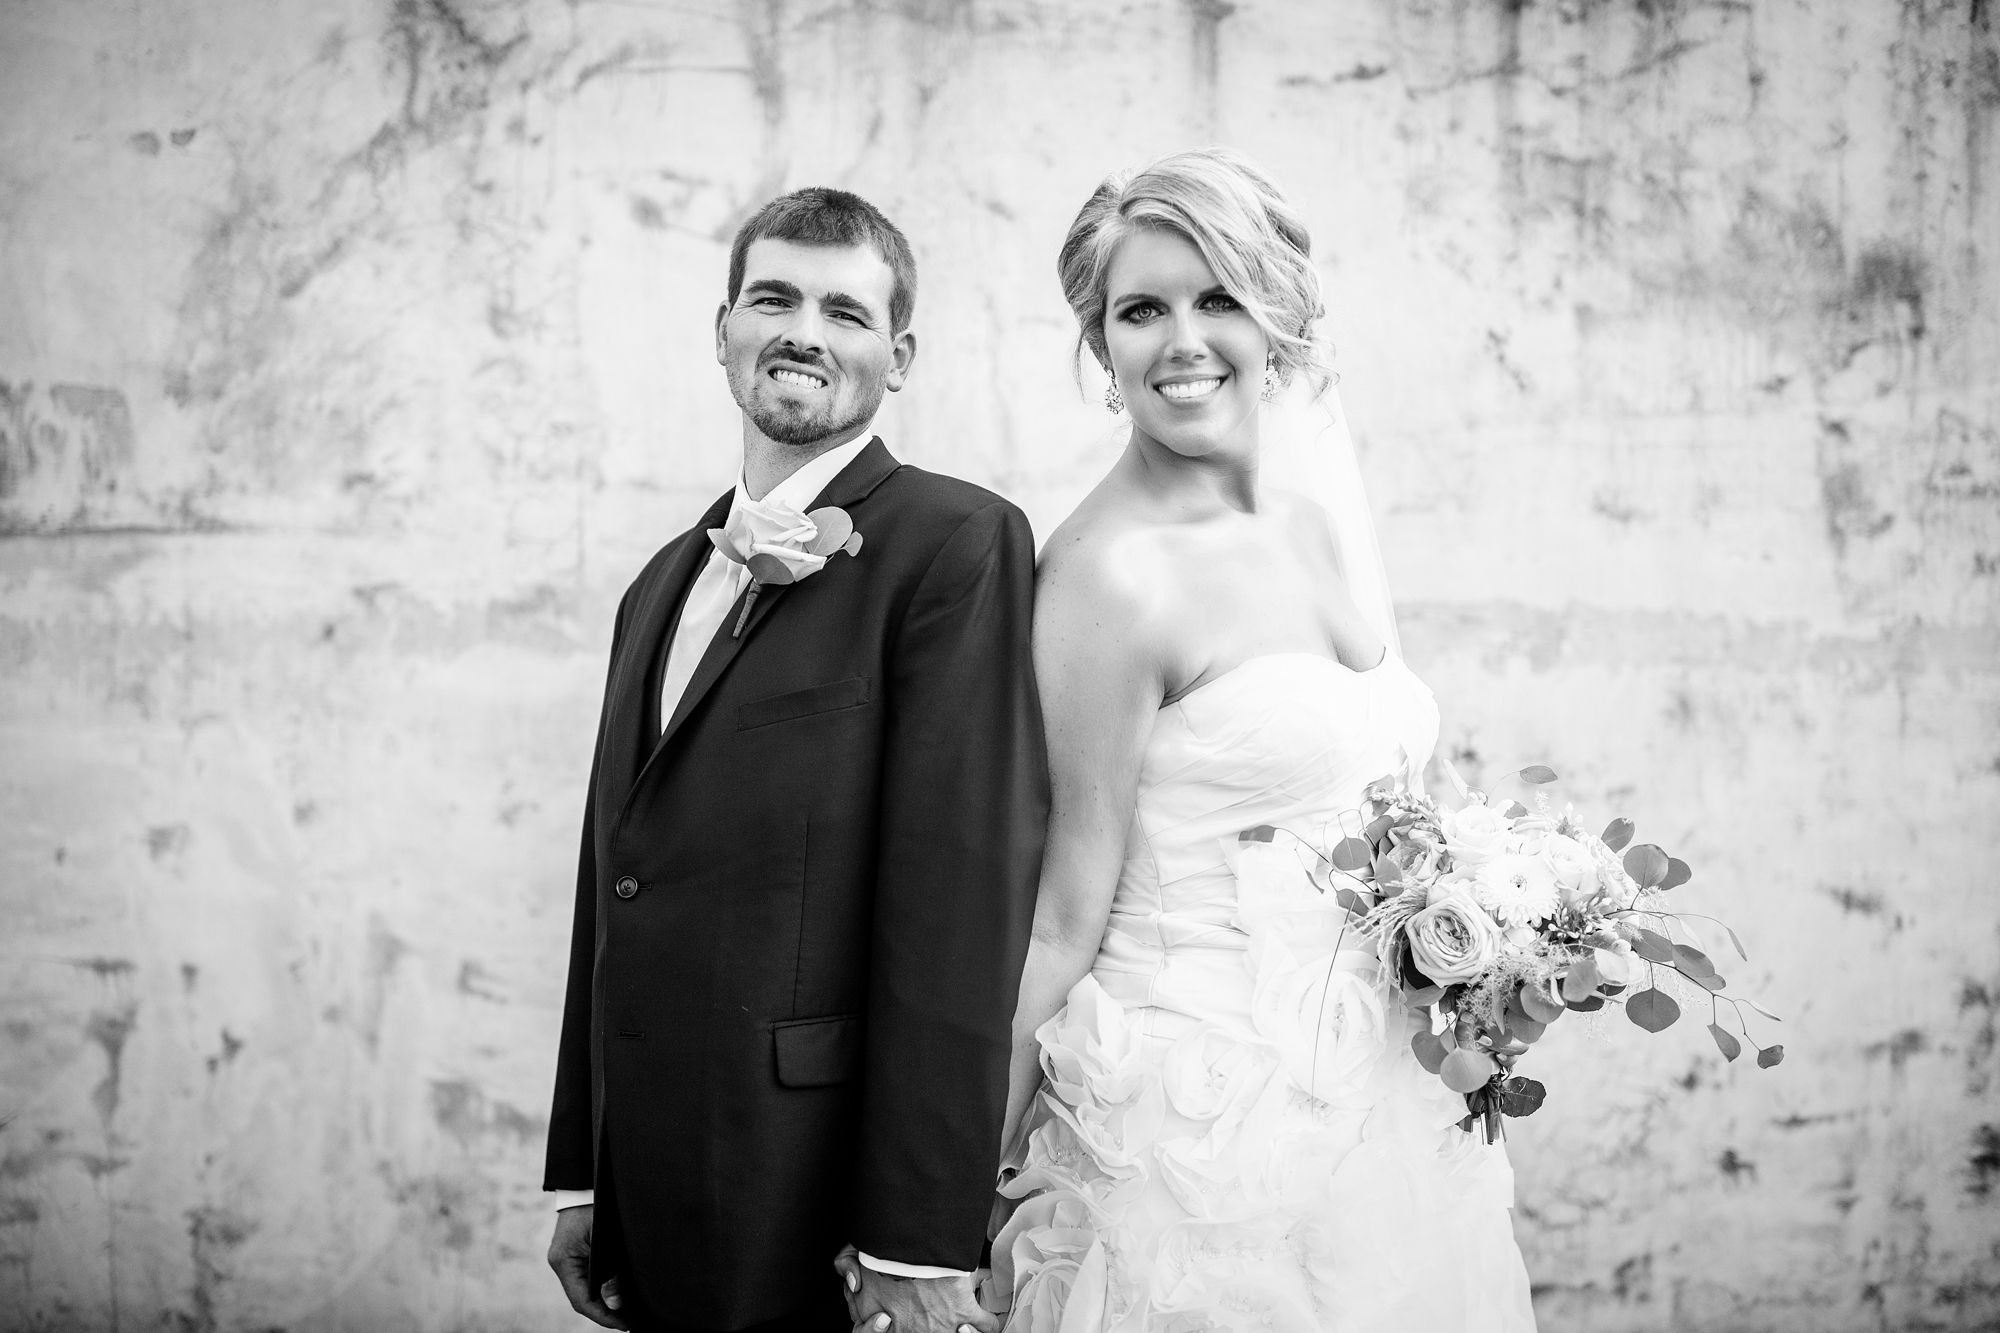 Seriously_Sabrina_Photography_Ashland_Kentucky_Train_Depot_Wedding_Parsons53.jpg